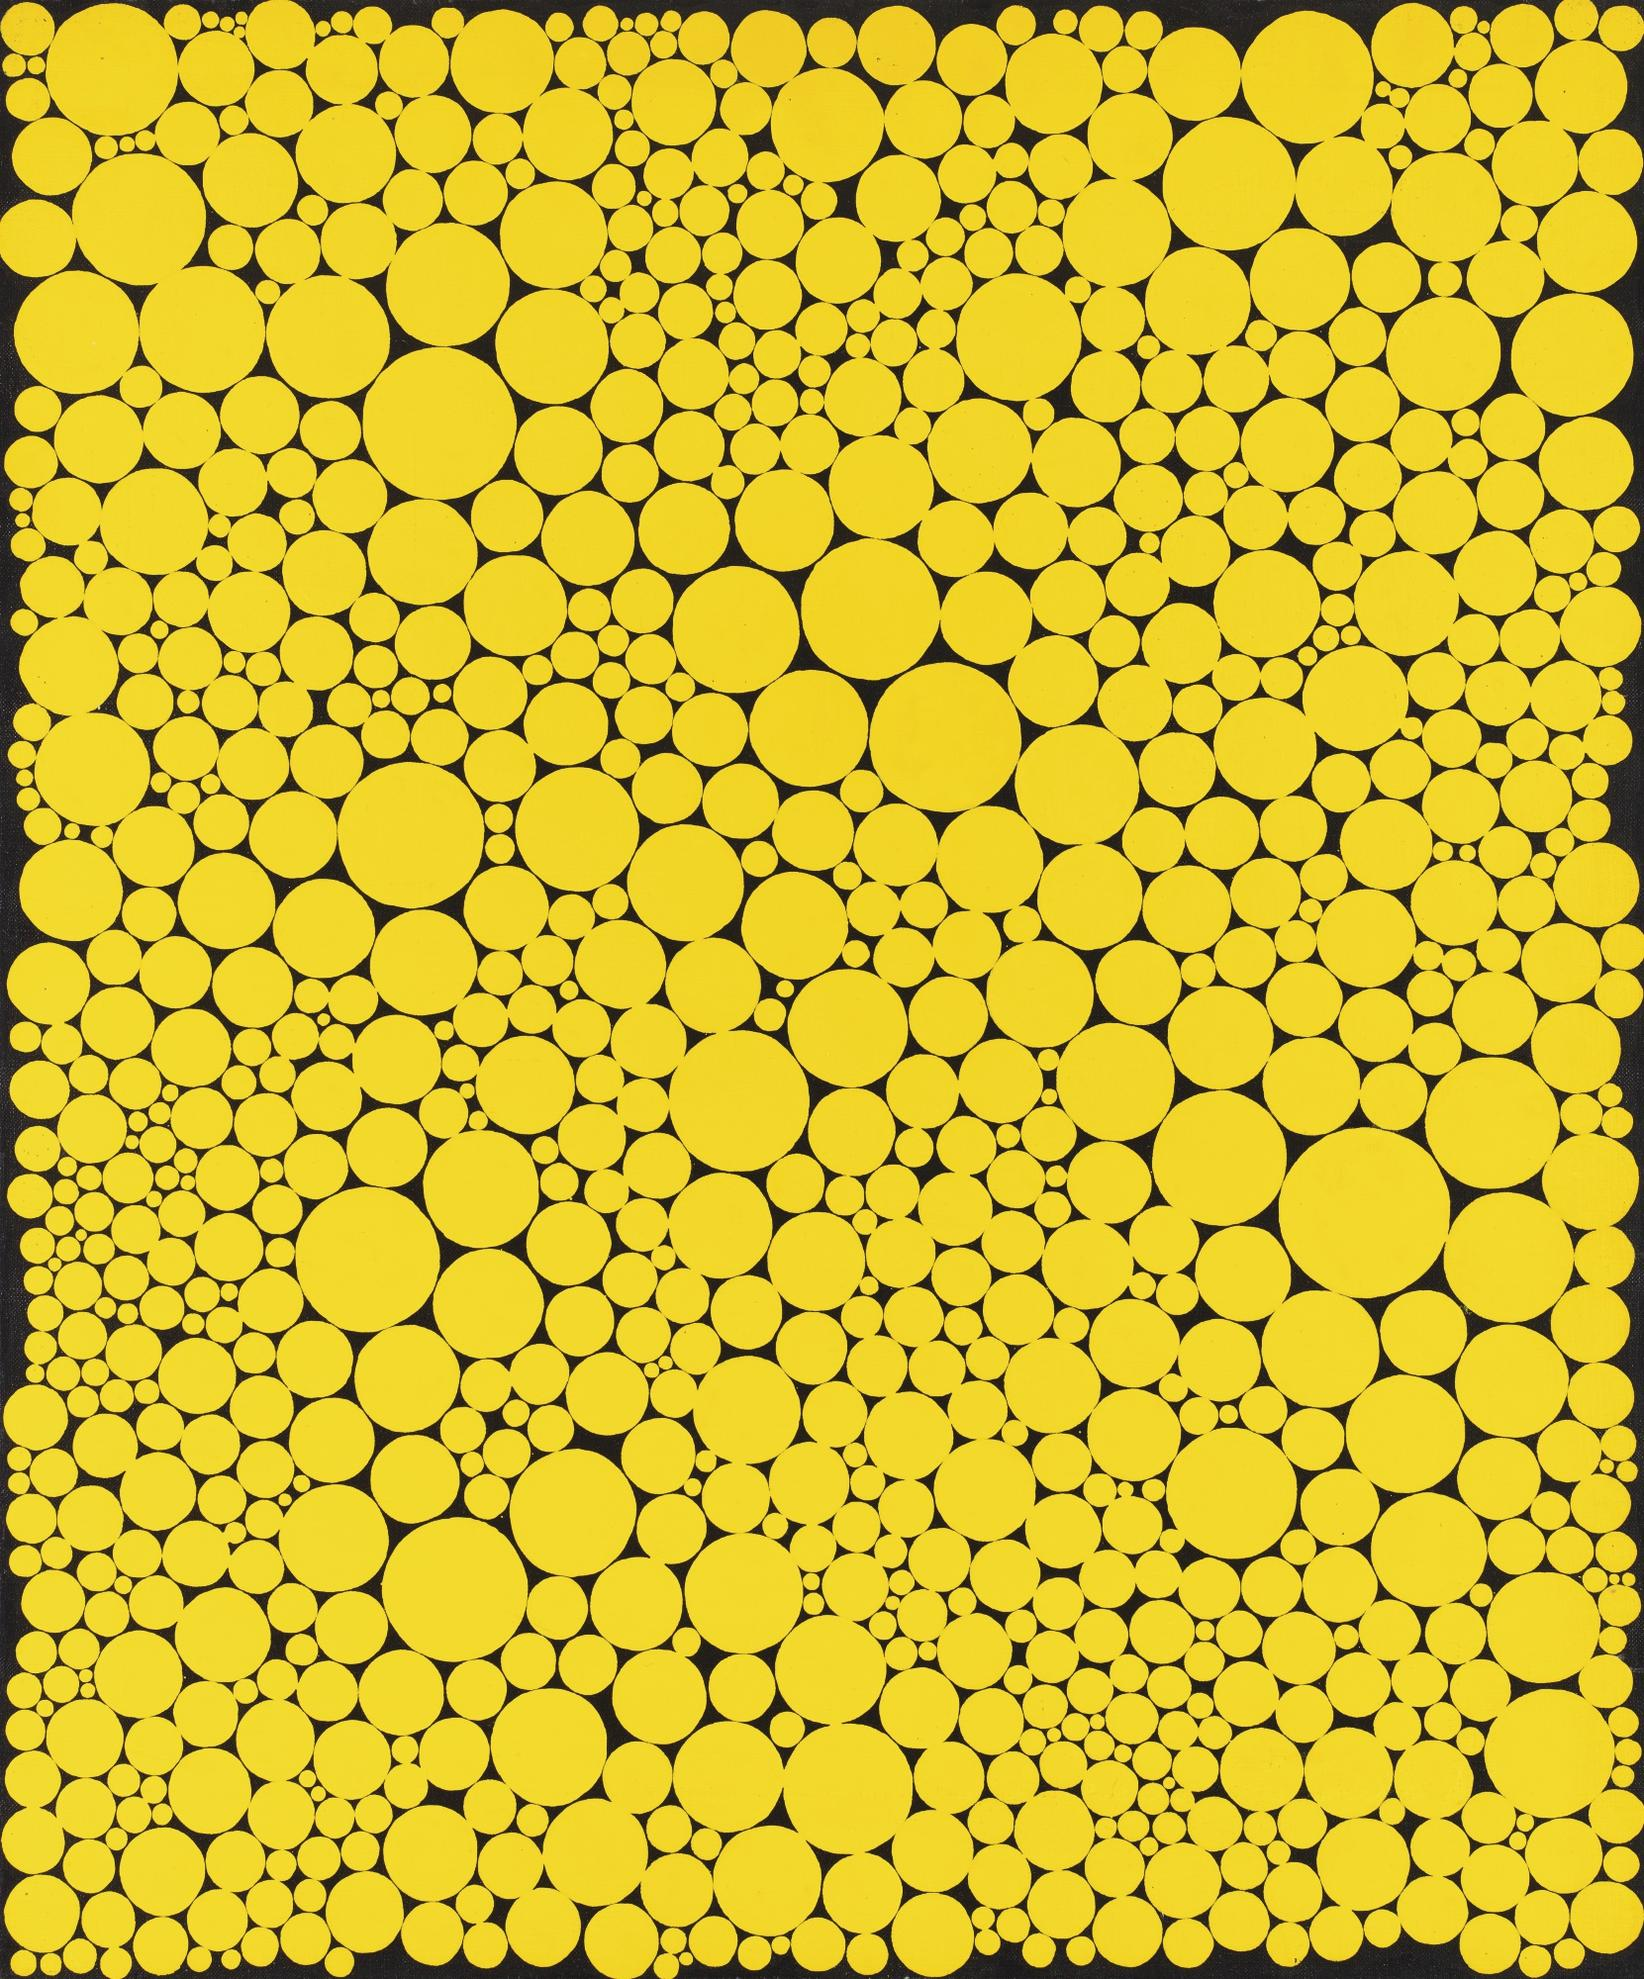 Yayoi Kusama-Dots-1990